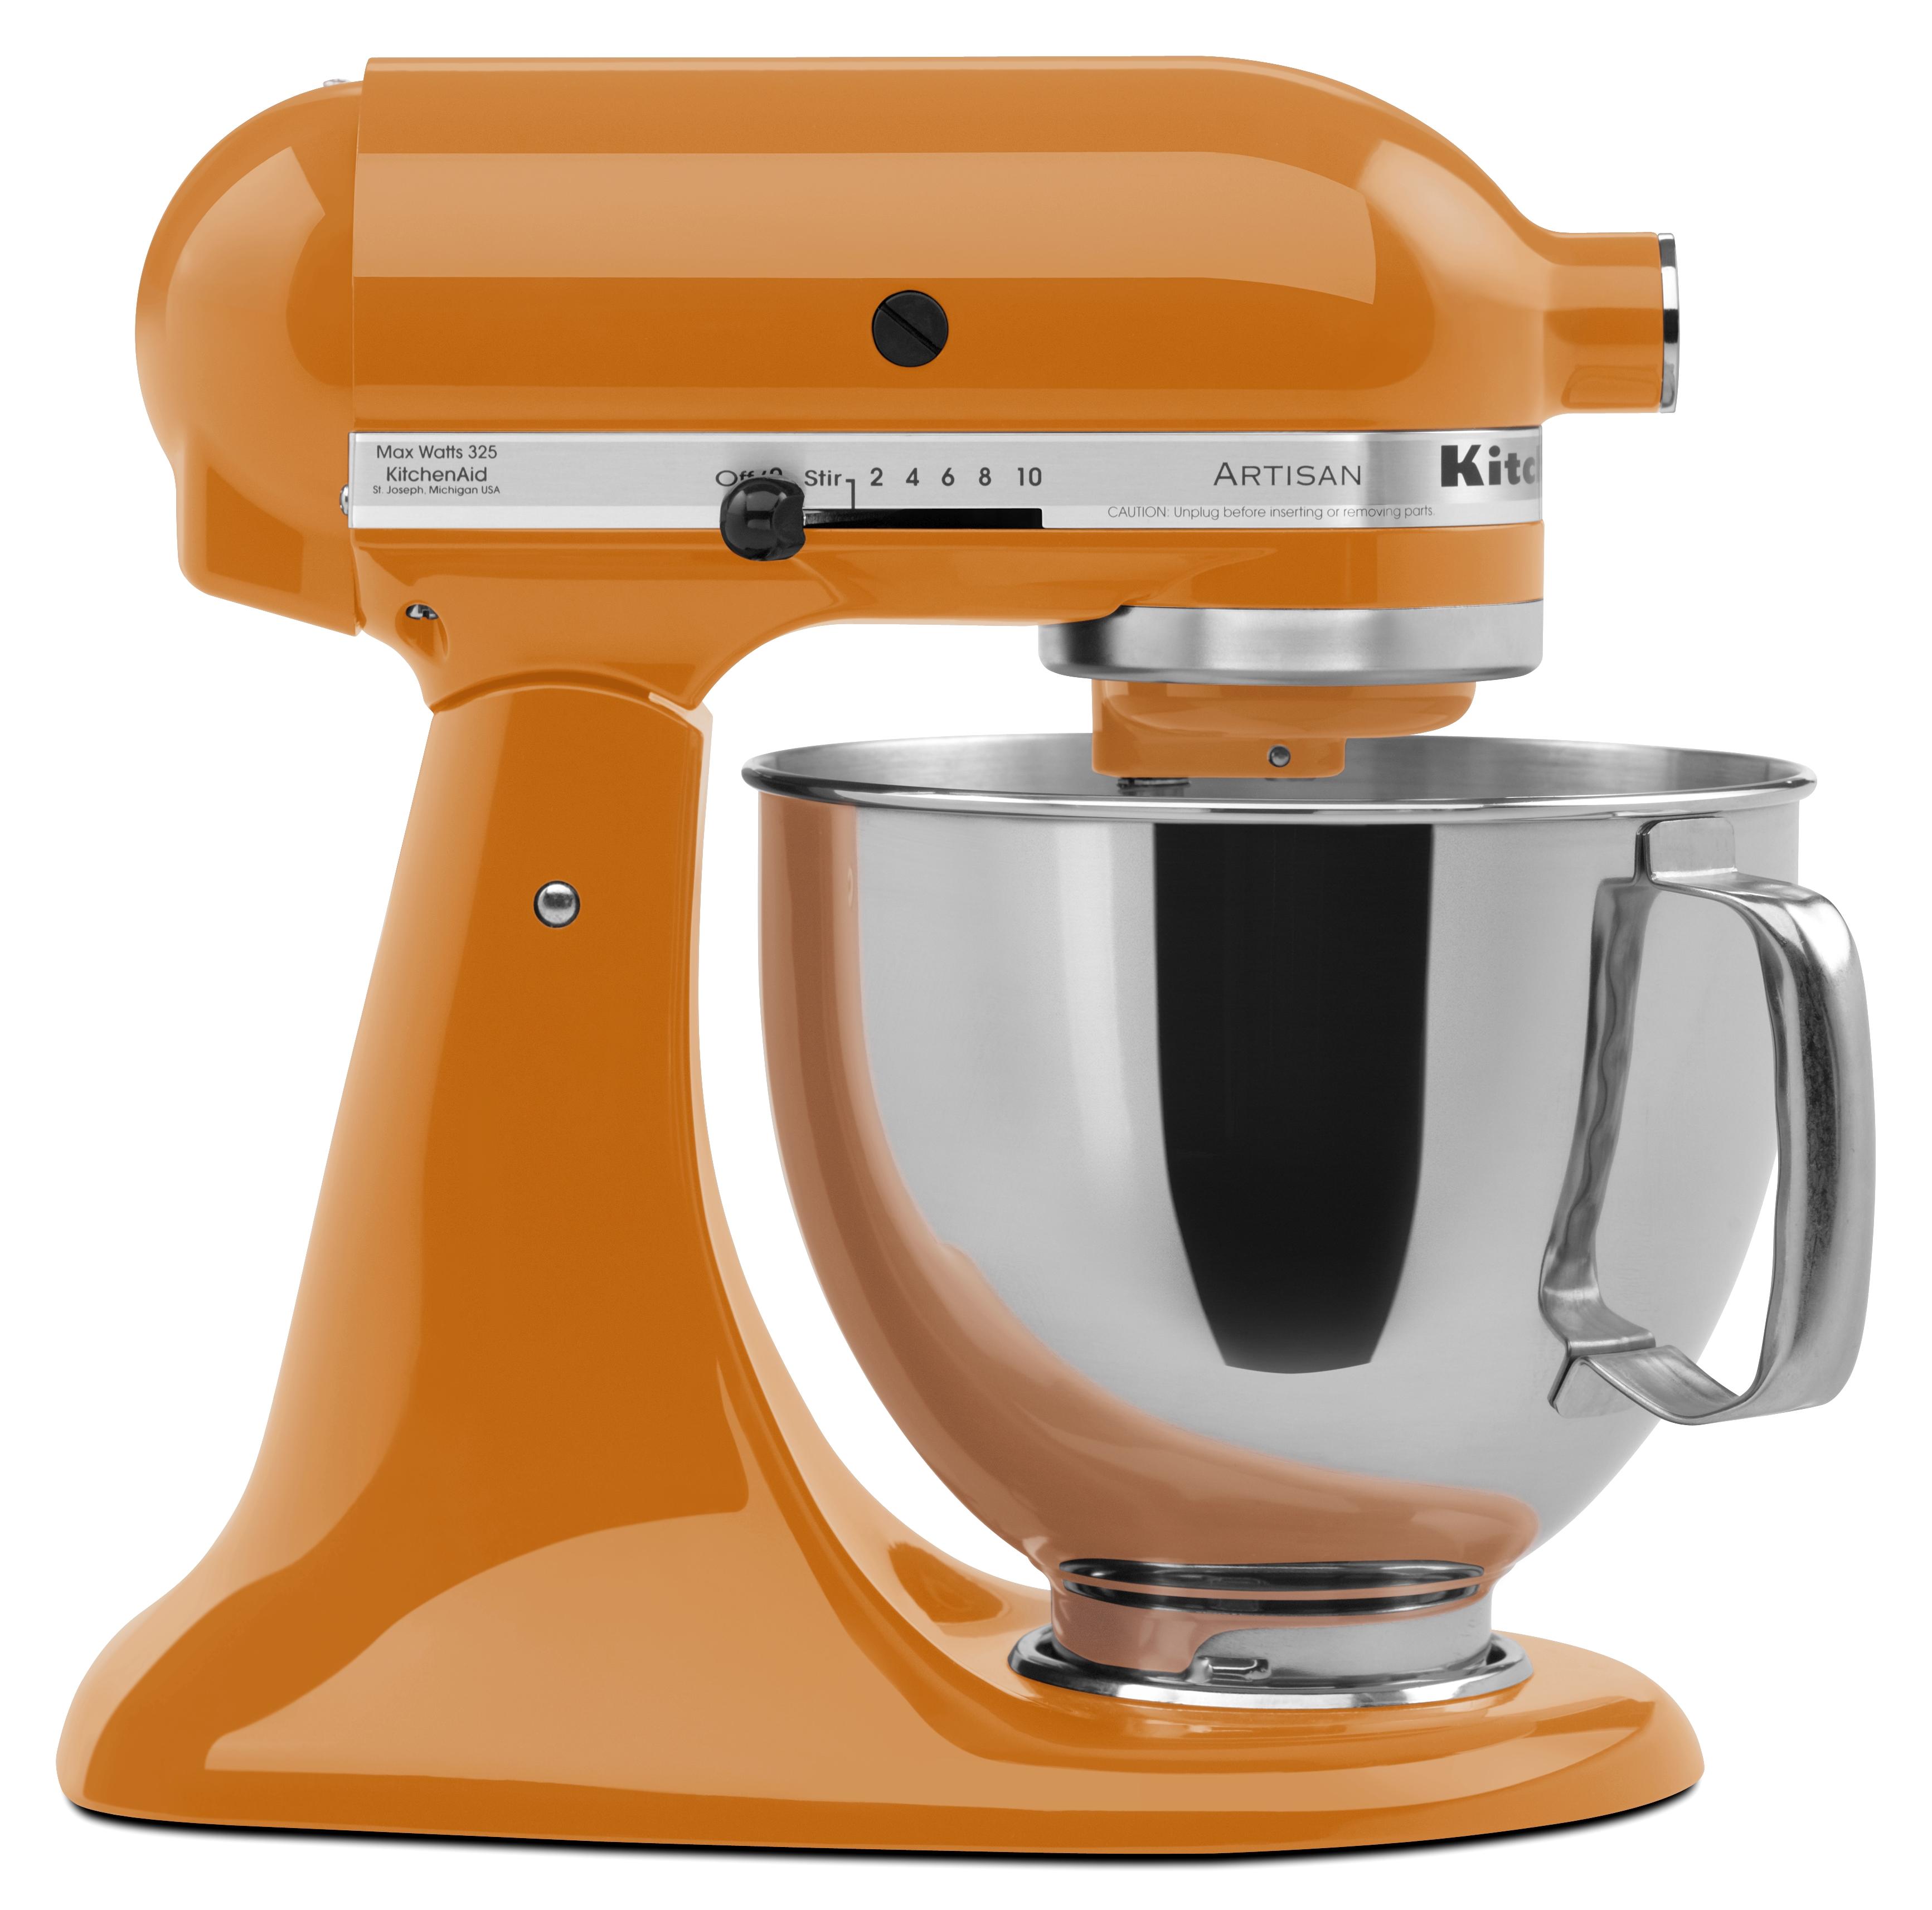 KitchenAid - Stand Mixer Tangerine - R$ 2299